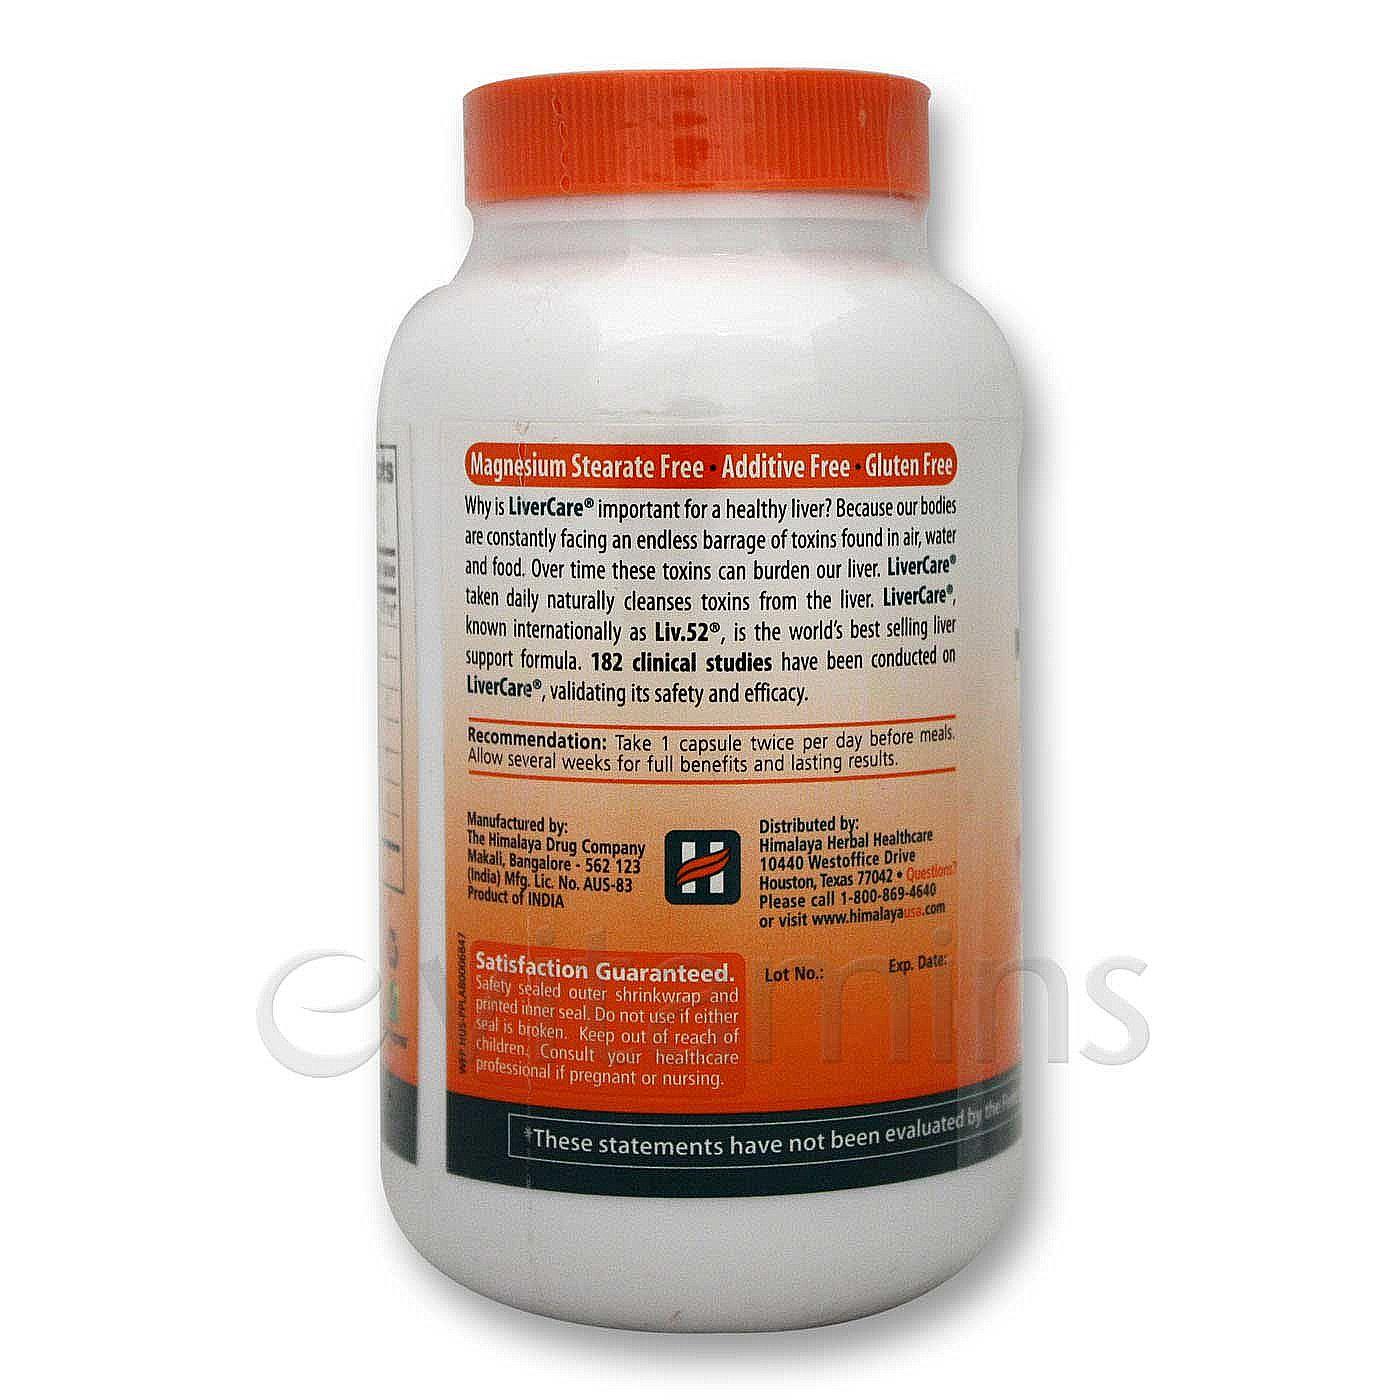 Liv52 Himalaya Herbal Healthcare Benazepril 20 25 Mg Liv 52 100 Caps Products